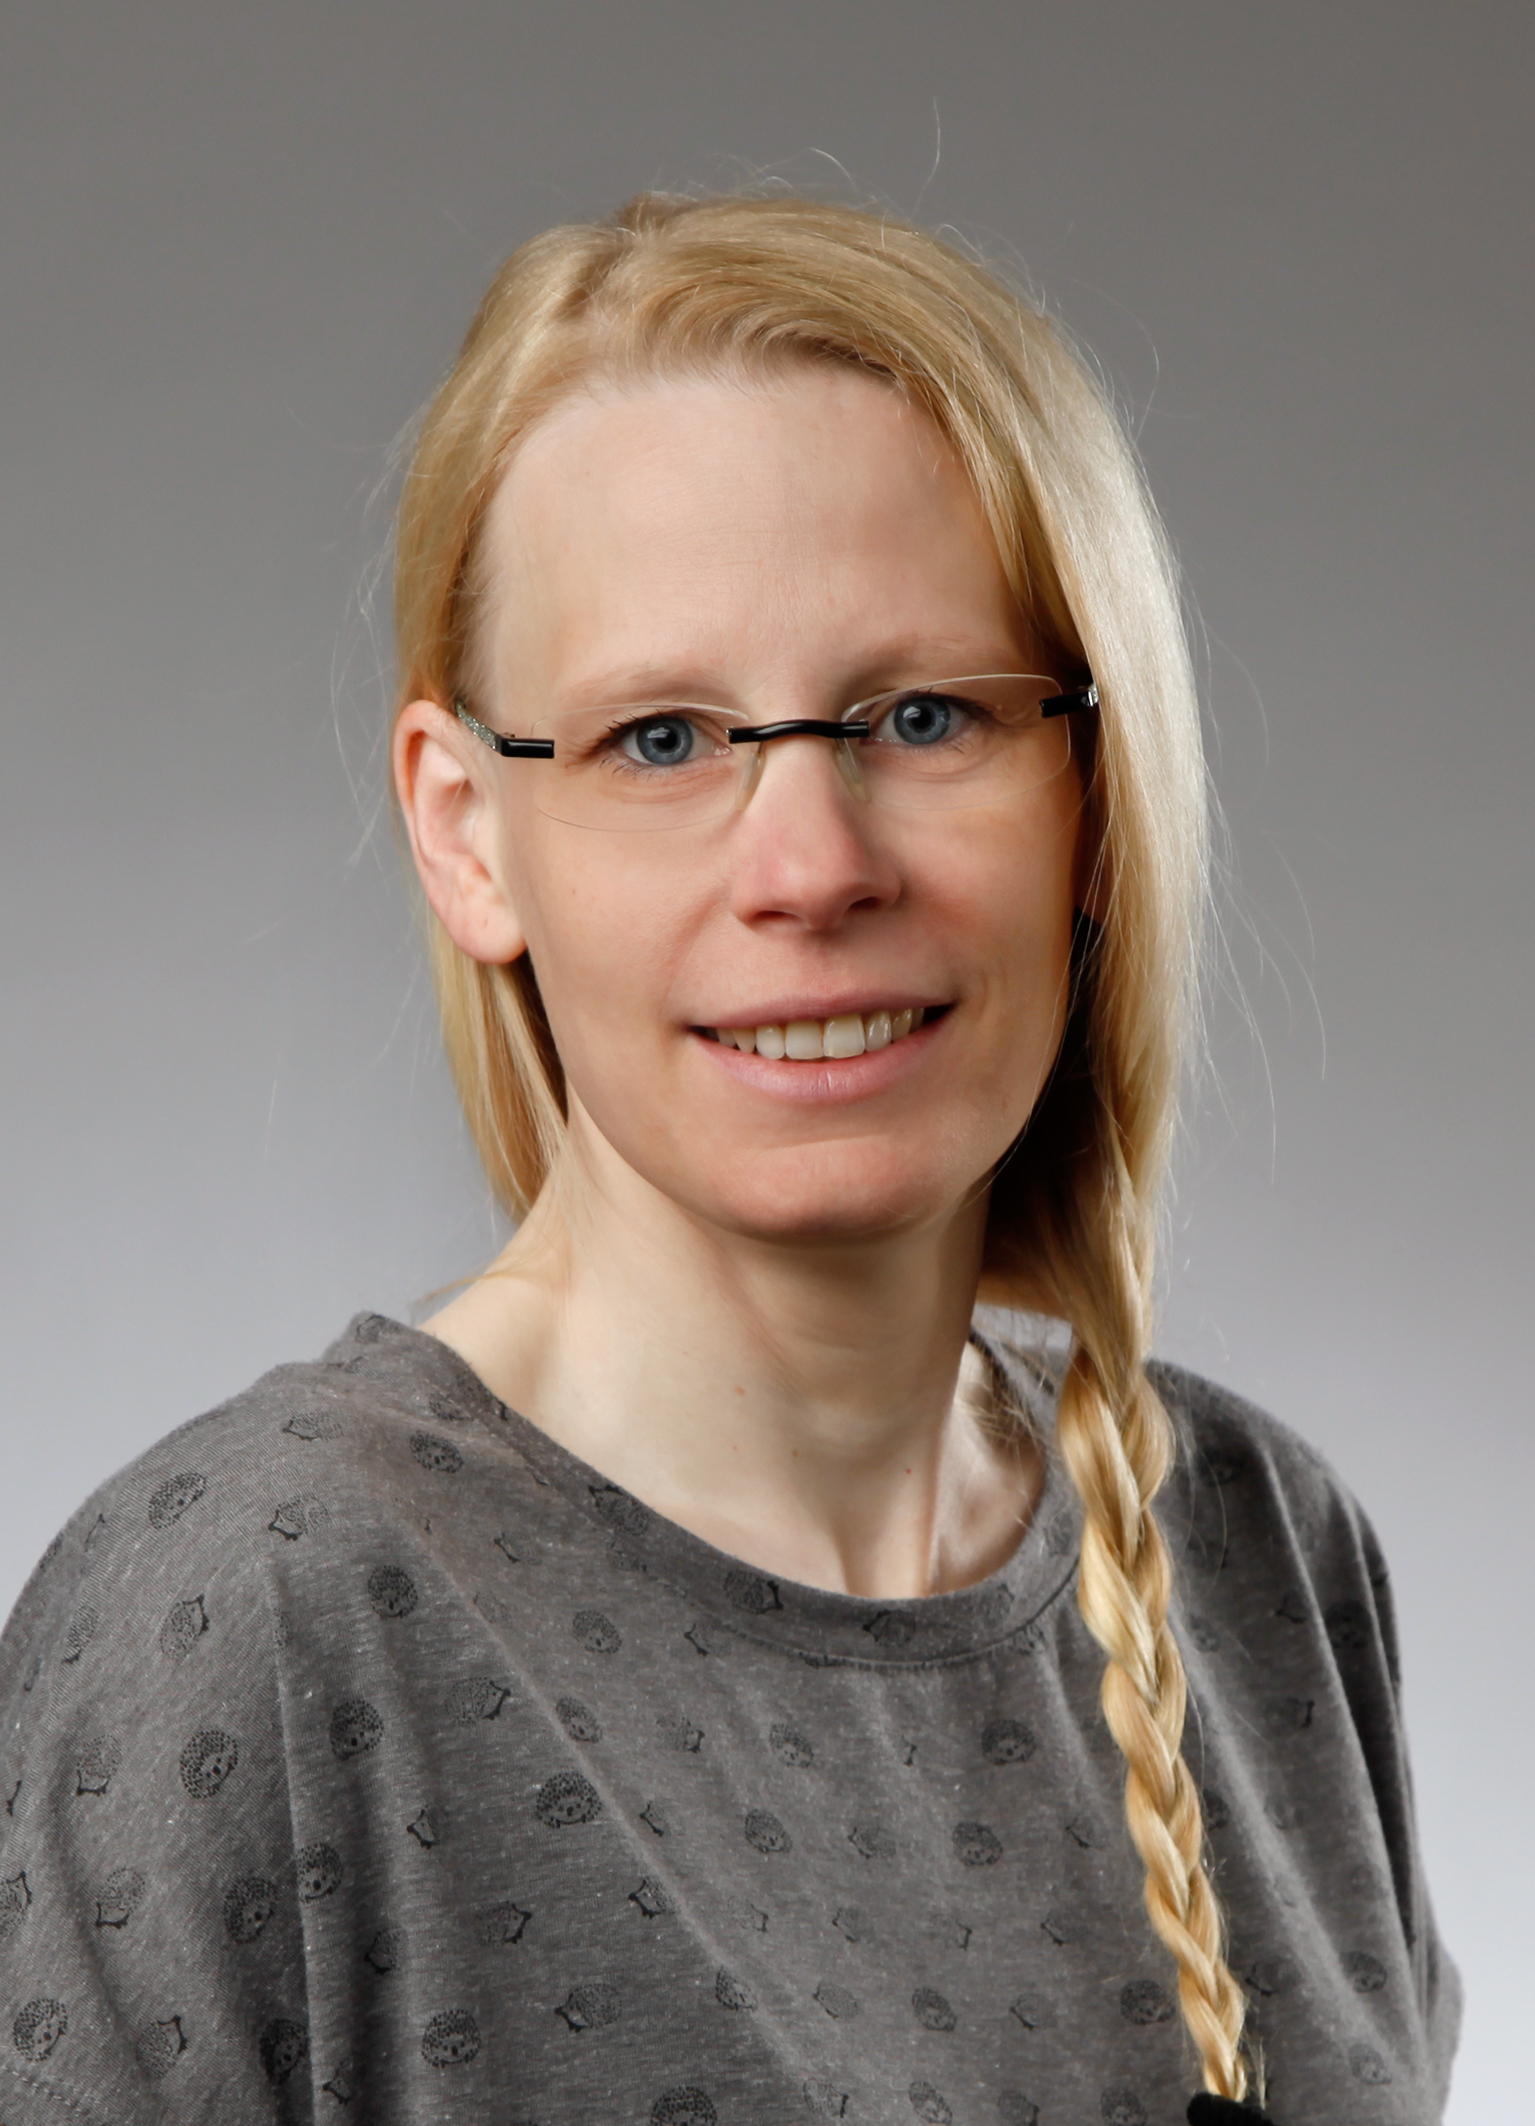 Martina Pritz